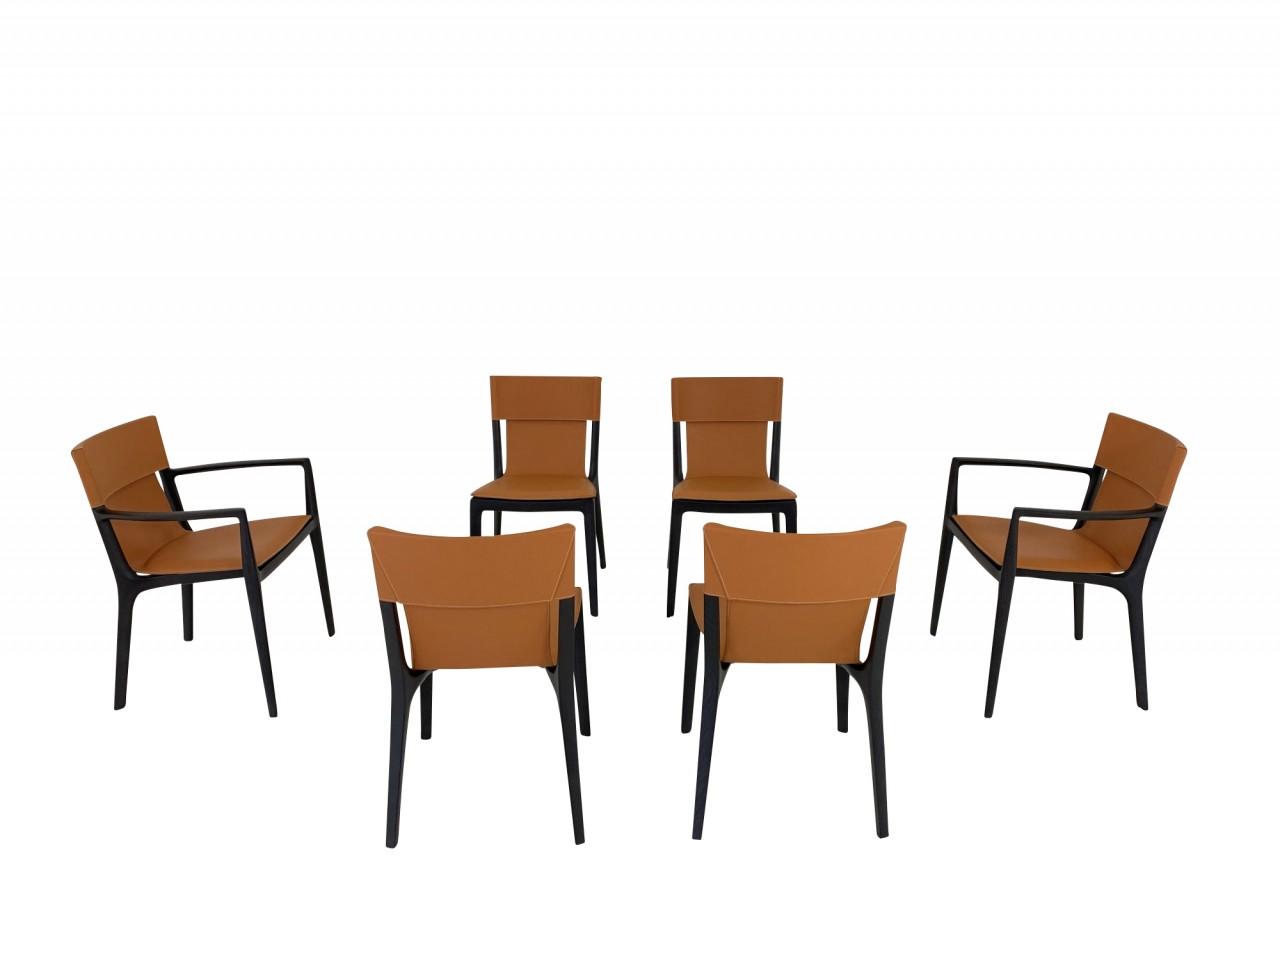 Poltrona Frau ISADORA Set aus 6 Stühlen im saddle extra Leder cammello